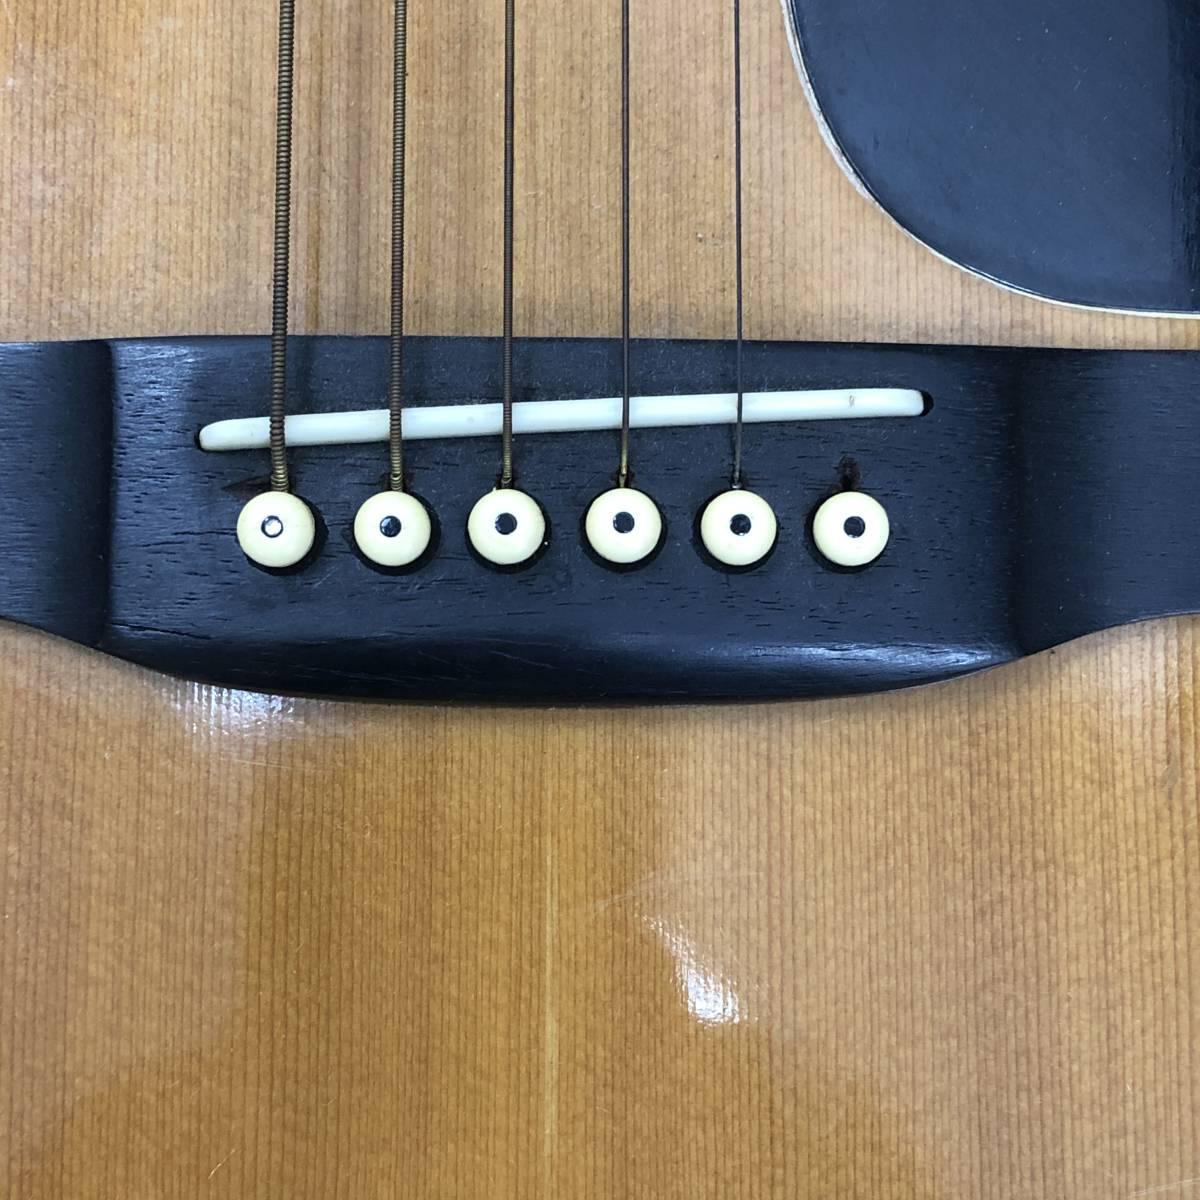 【SS】TOKAI トーカイ 東海楽器 Cat's Eyes MODEL CE500CF キャッツアイ ギターケース ハードケース 動作未確認 中古 レトロ ヴィンテージ_画像5